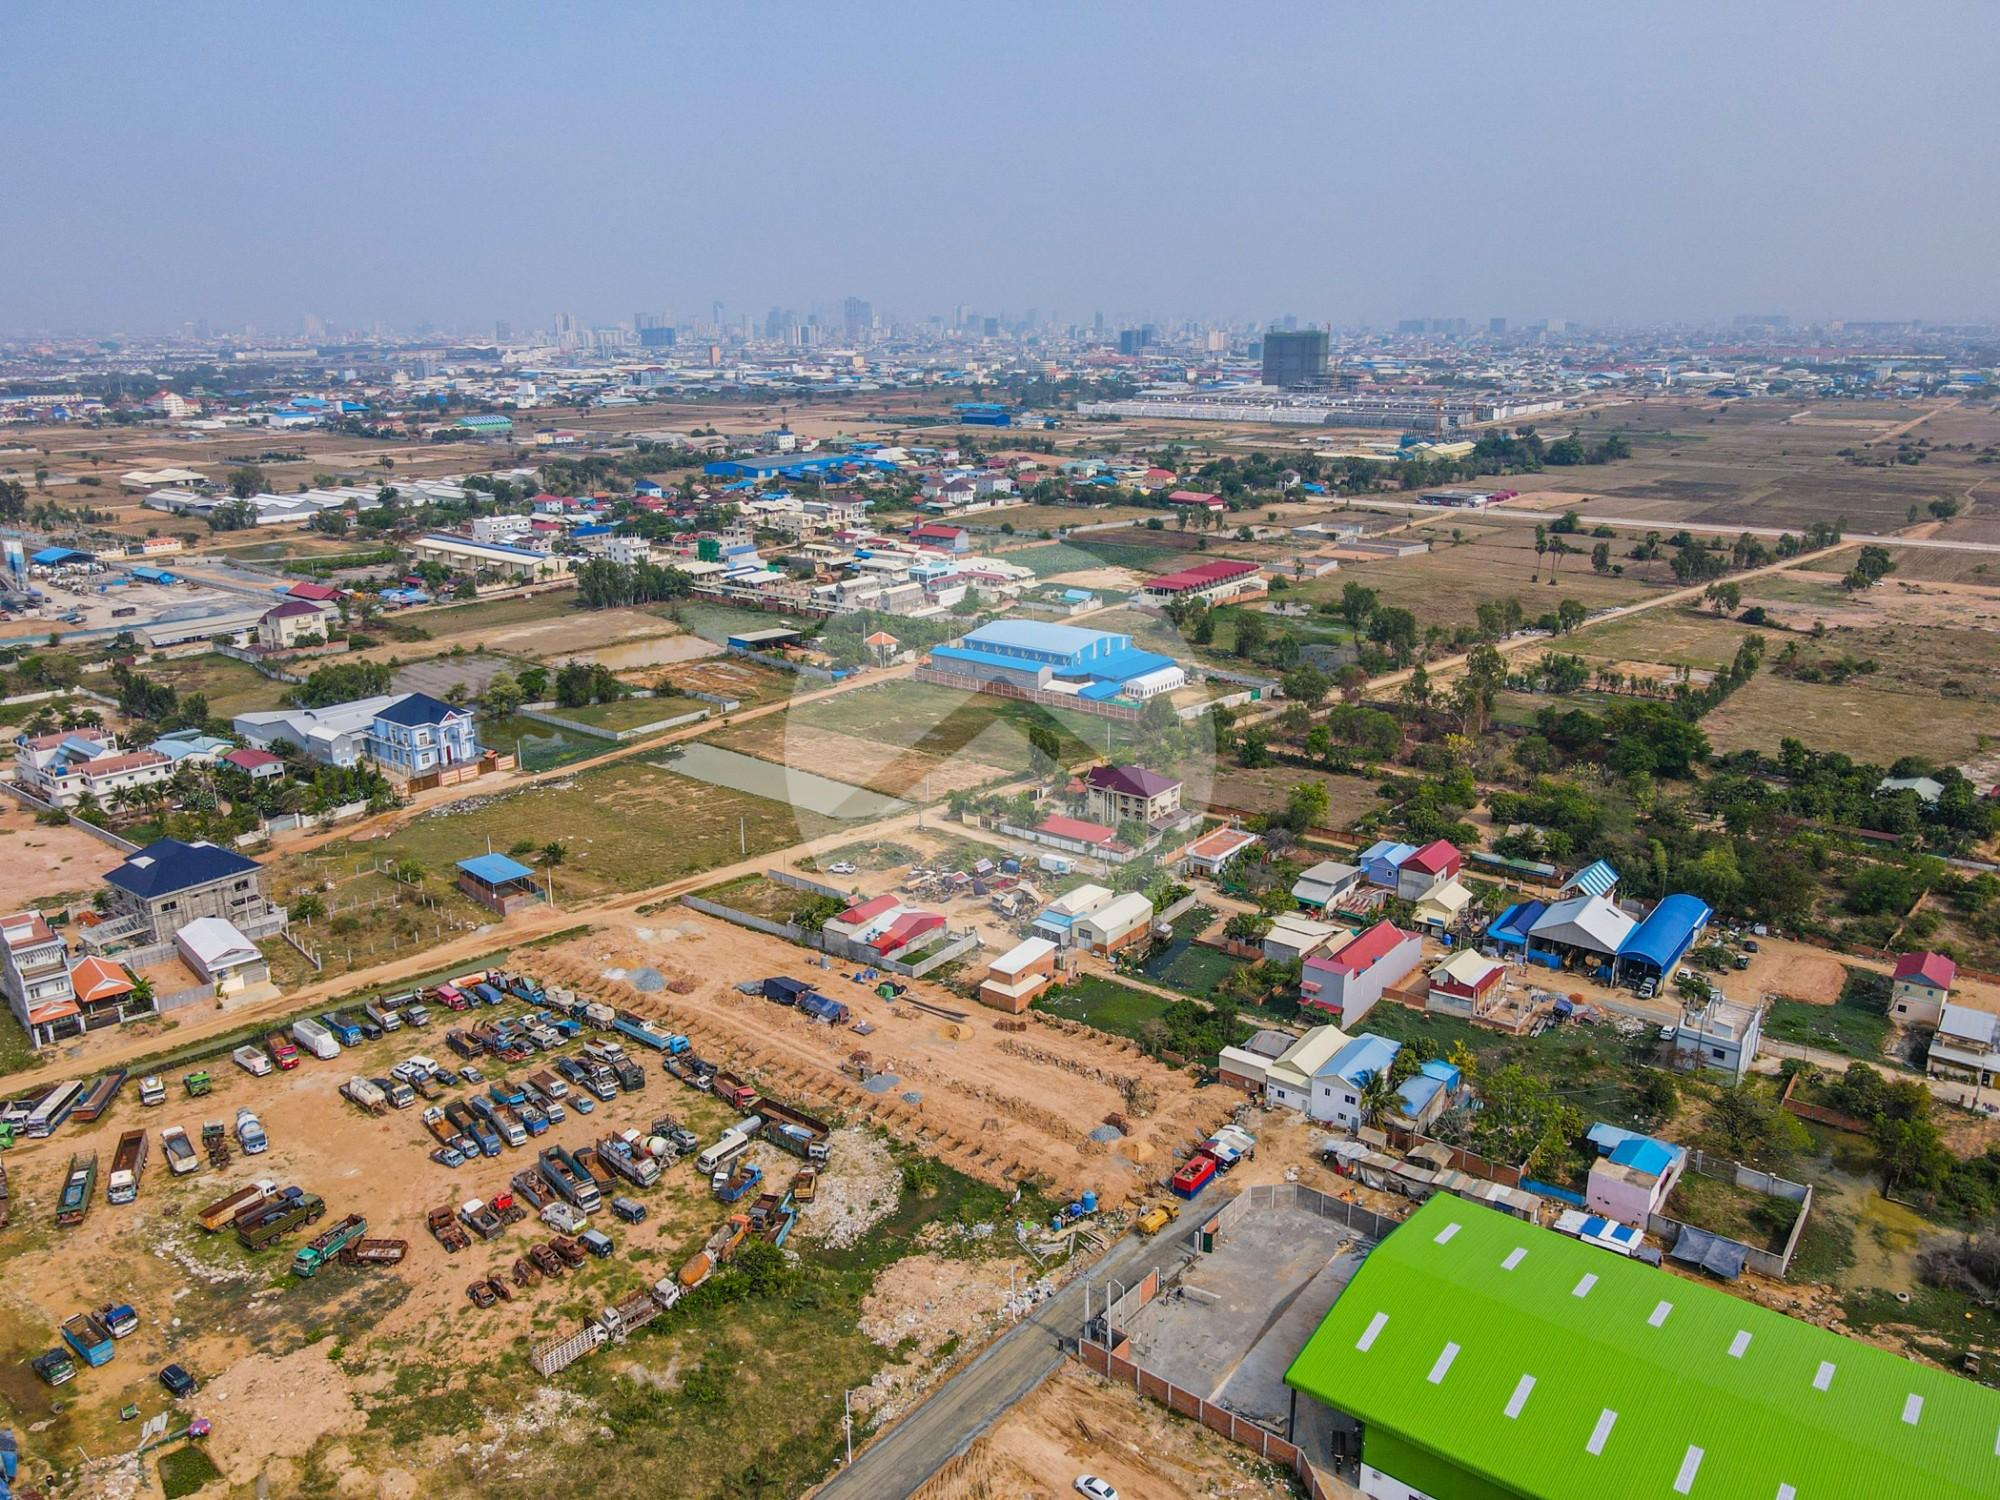 3467 Sqm Land For Rent - Khmounh, Phnom Penh